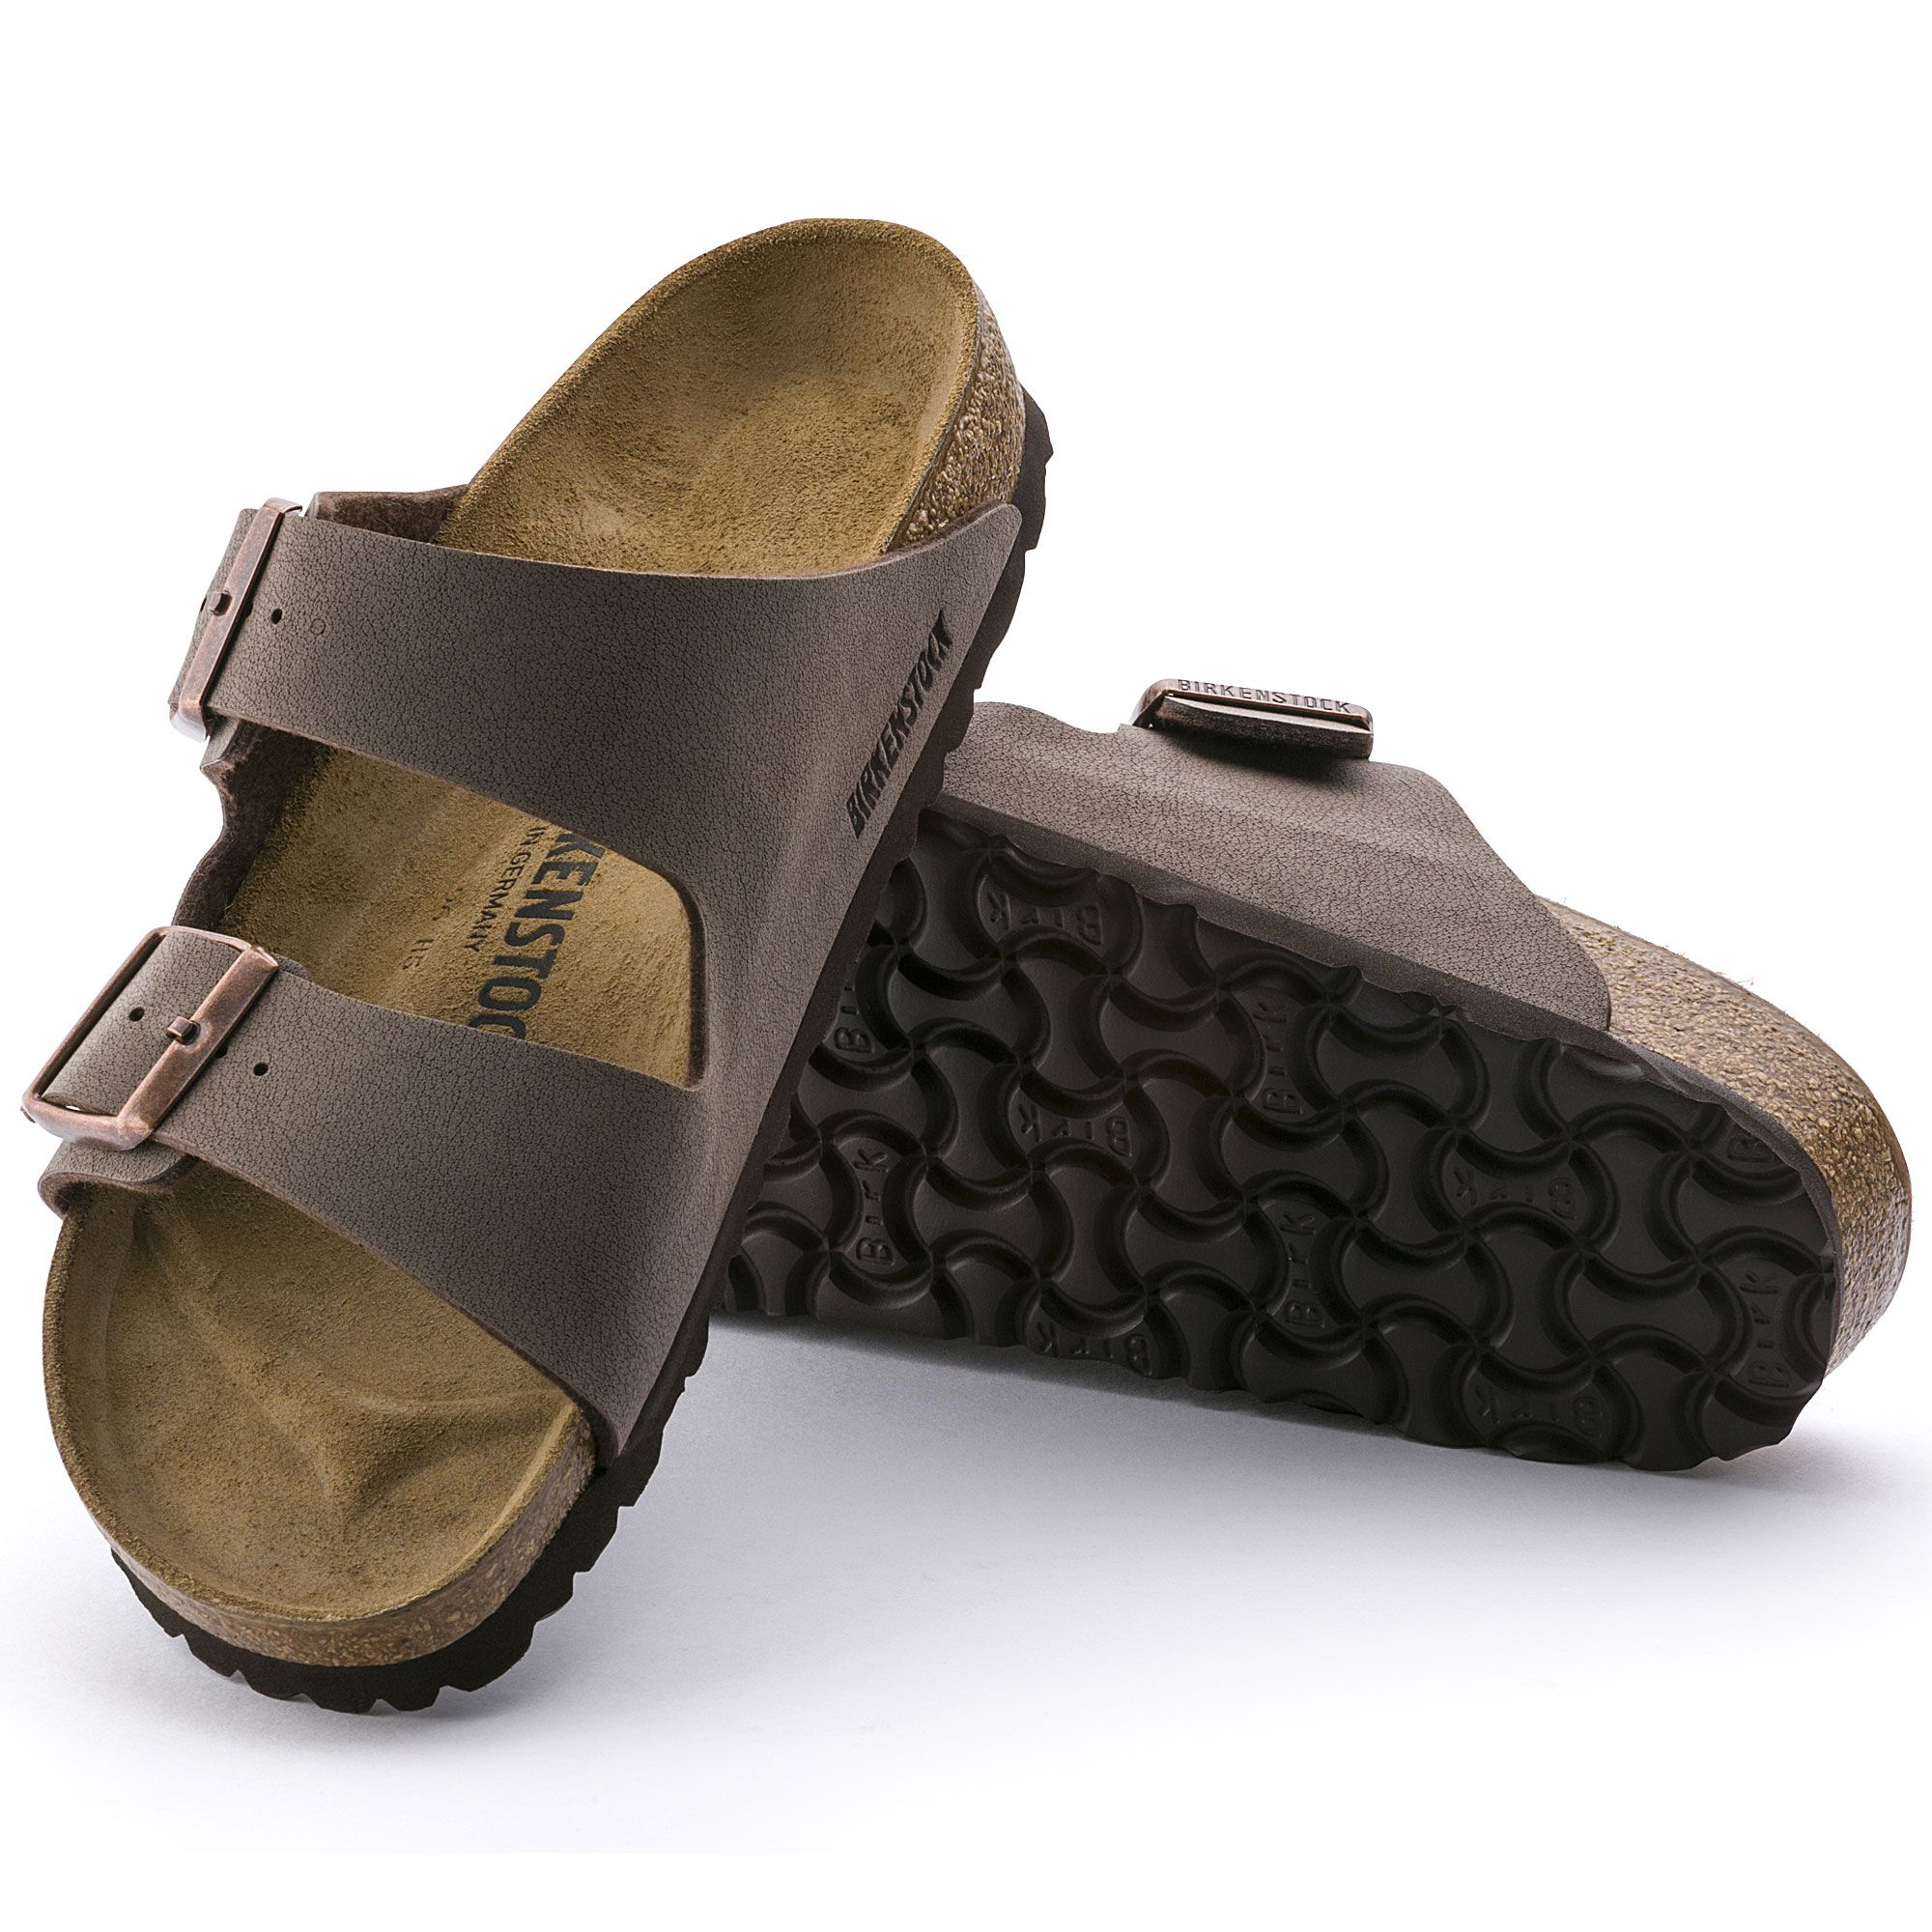 Arizona Birko Flor Nubuck | Birkenstock, Strap sandals